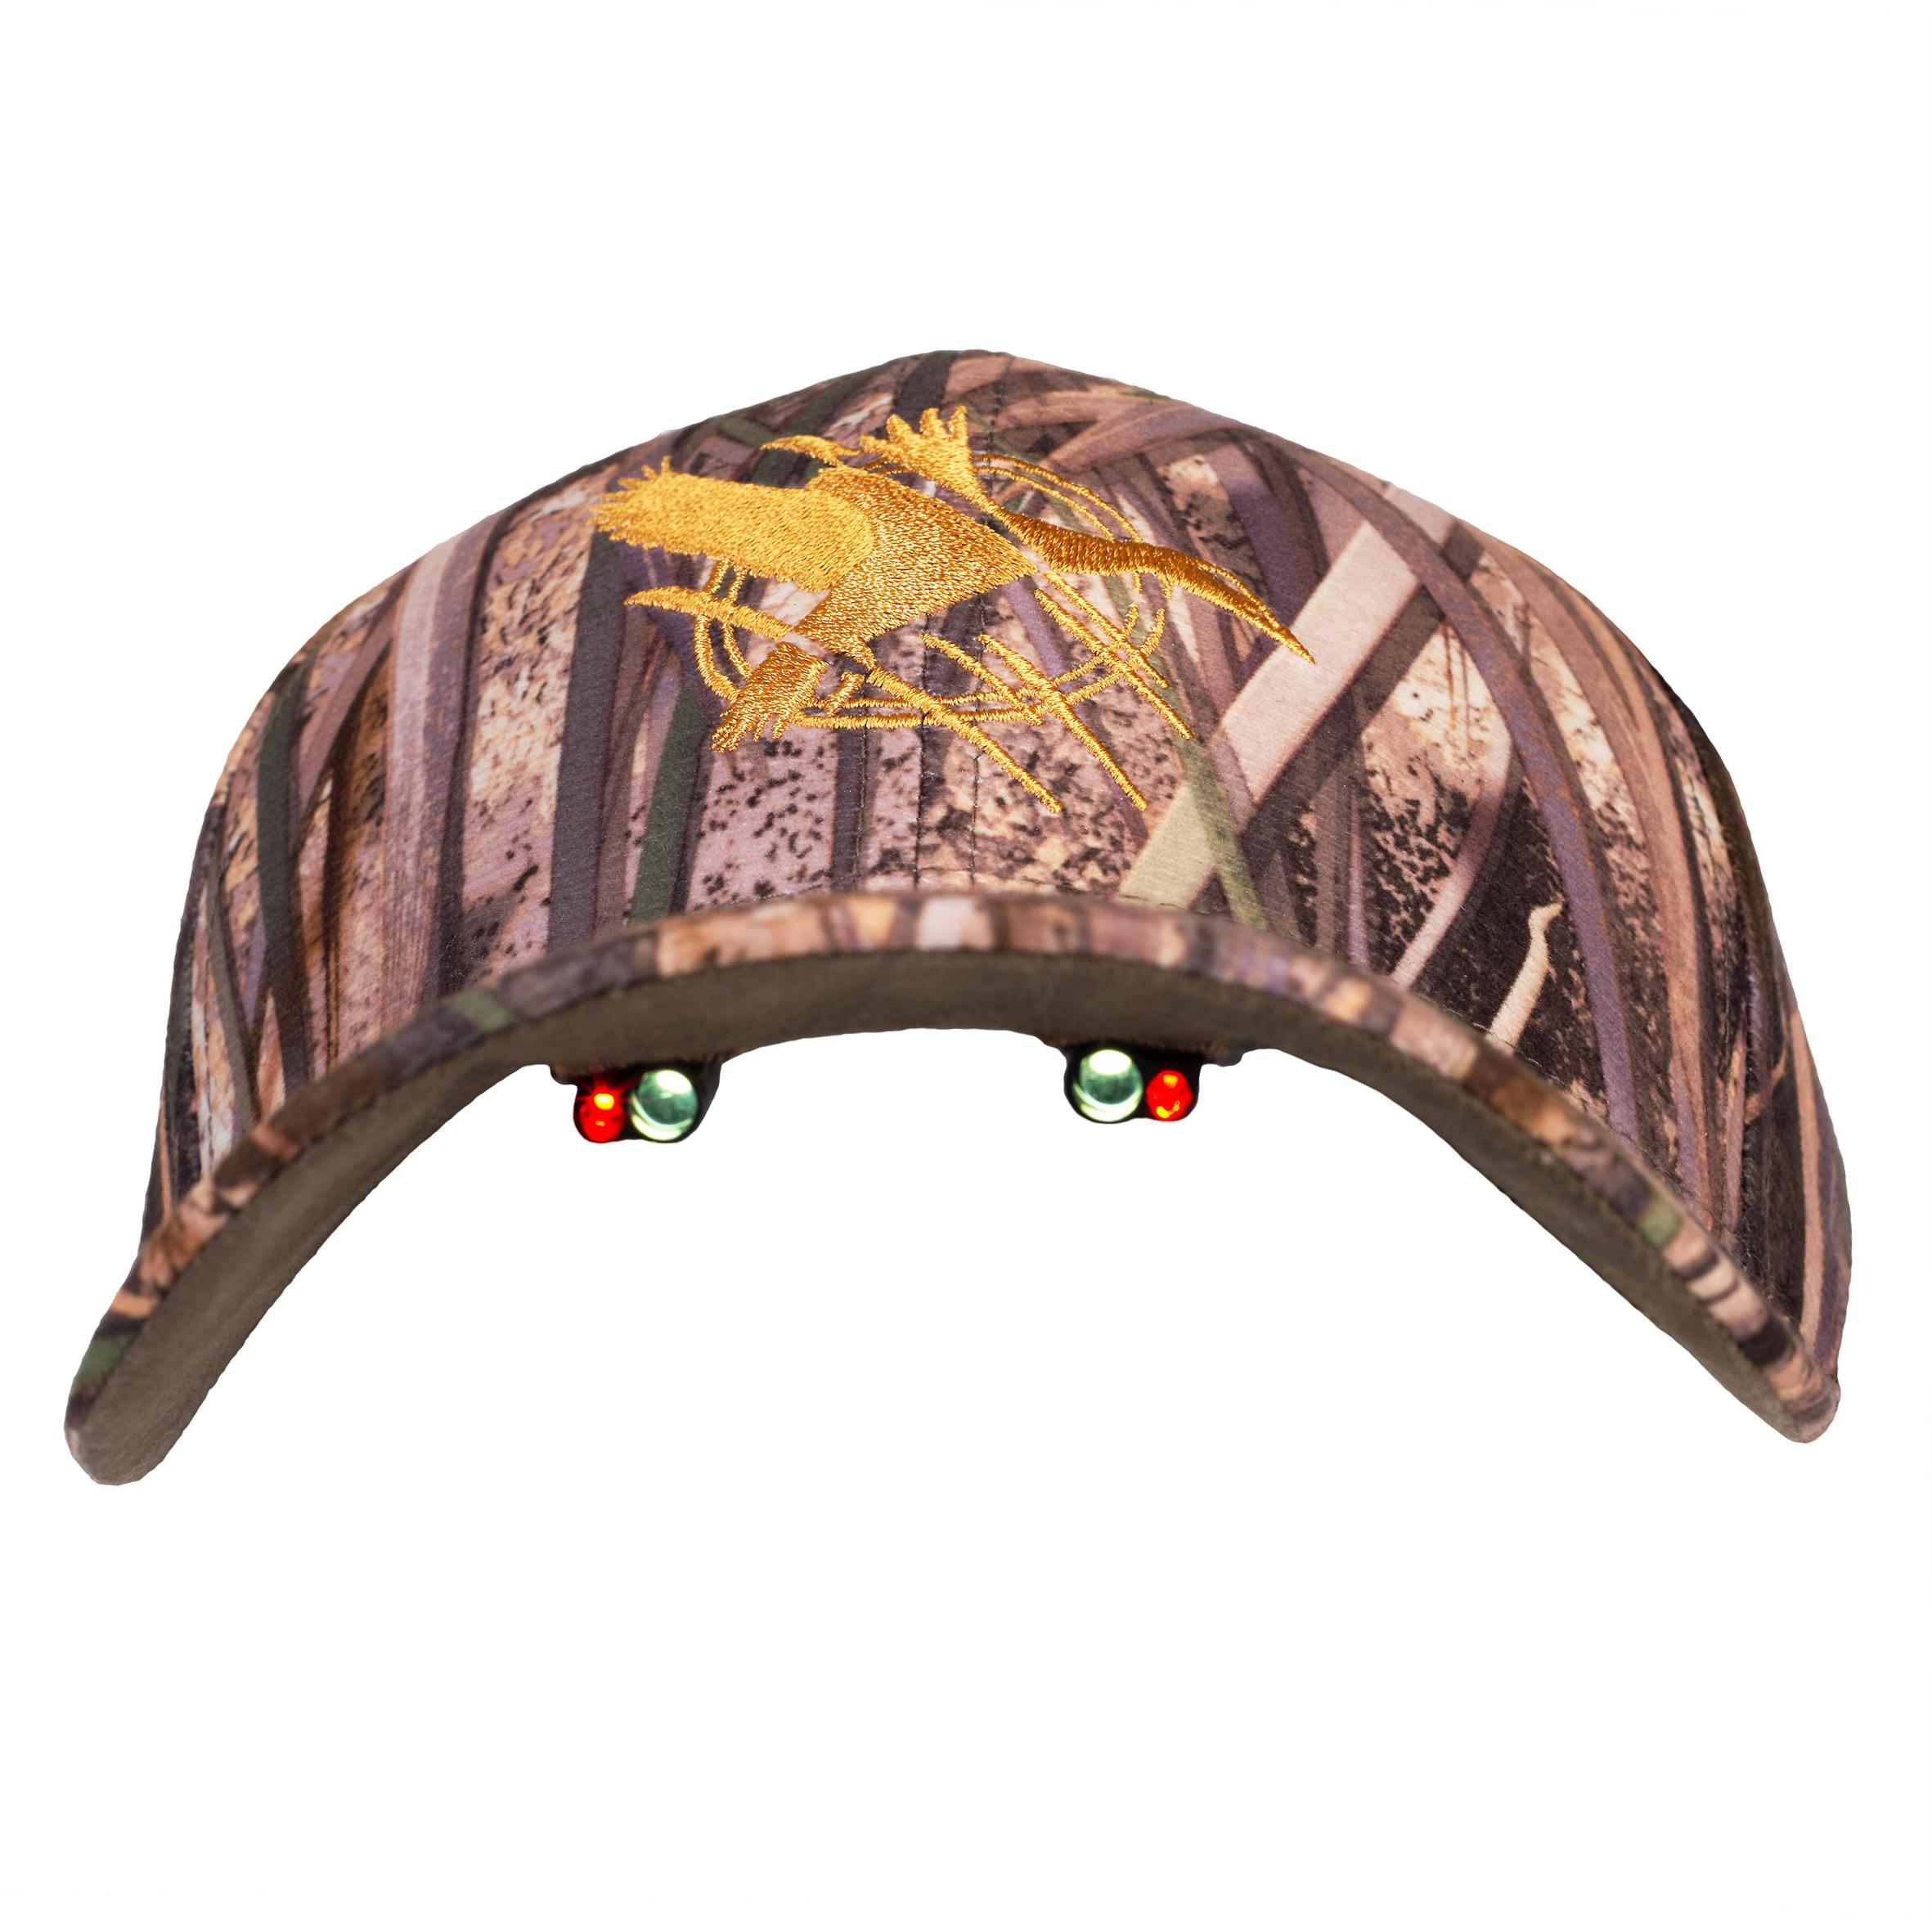 Jagd-Schirmmütze beleuchtet 500 LED Camouflage | Accessoires > Mützen > Sonstige Mützen | Solognac